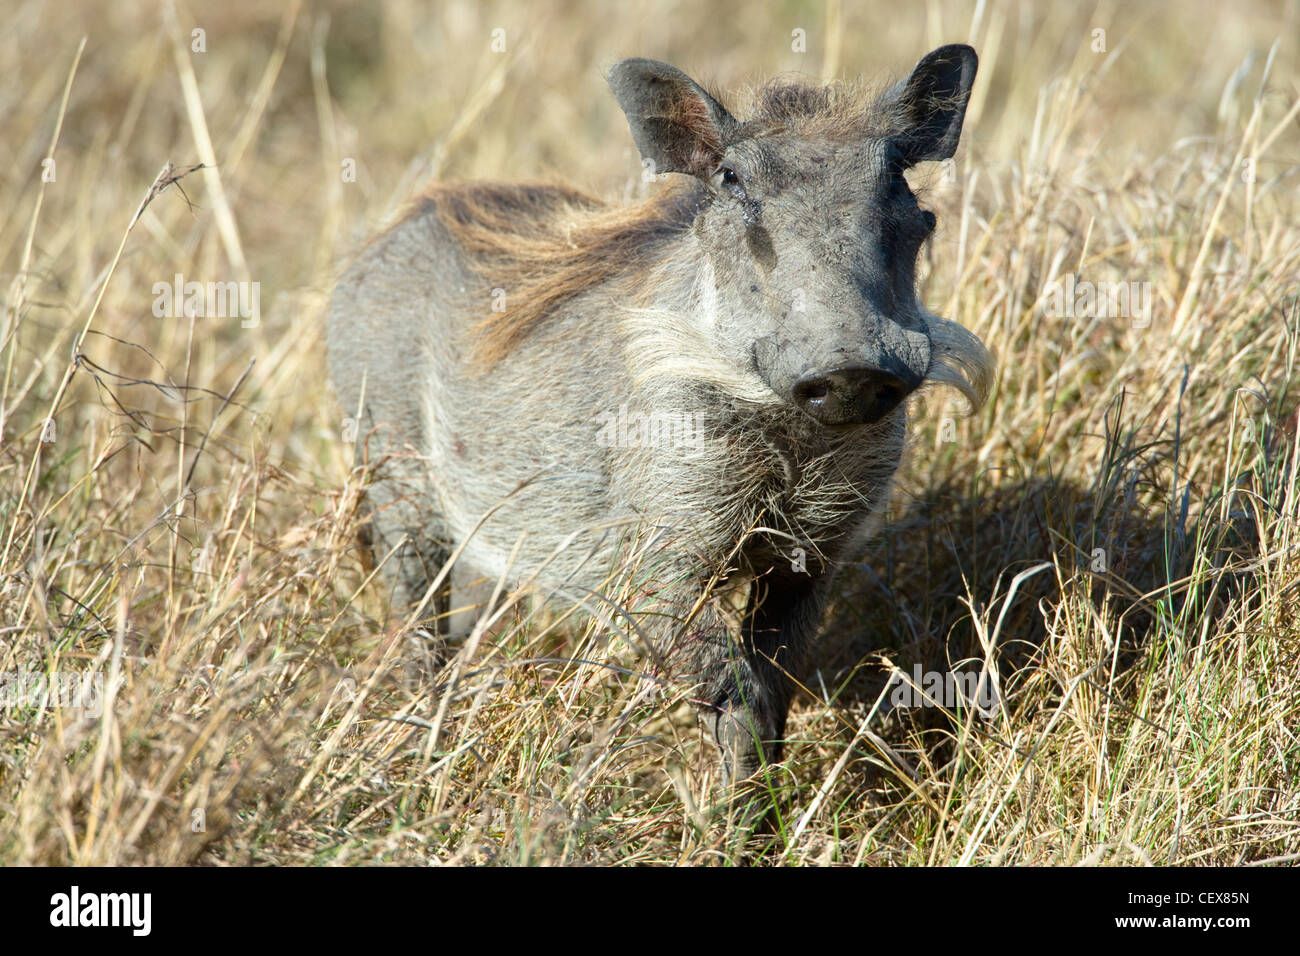 Young Warthog, Phacochoerus africanus, standing. Masai Mara, Kenya. - Stock Image